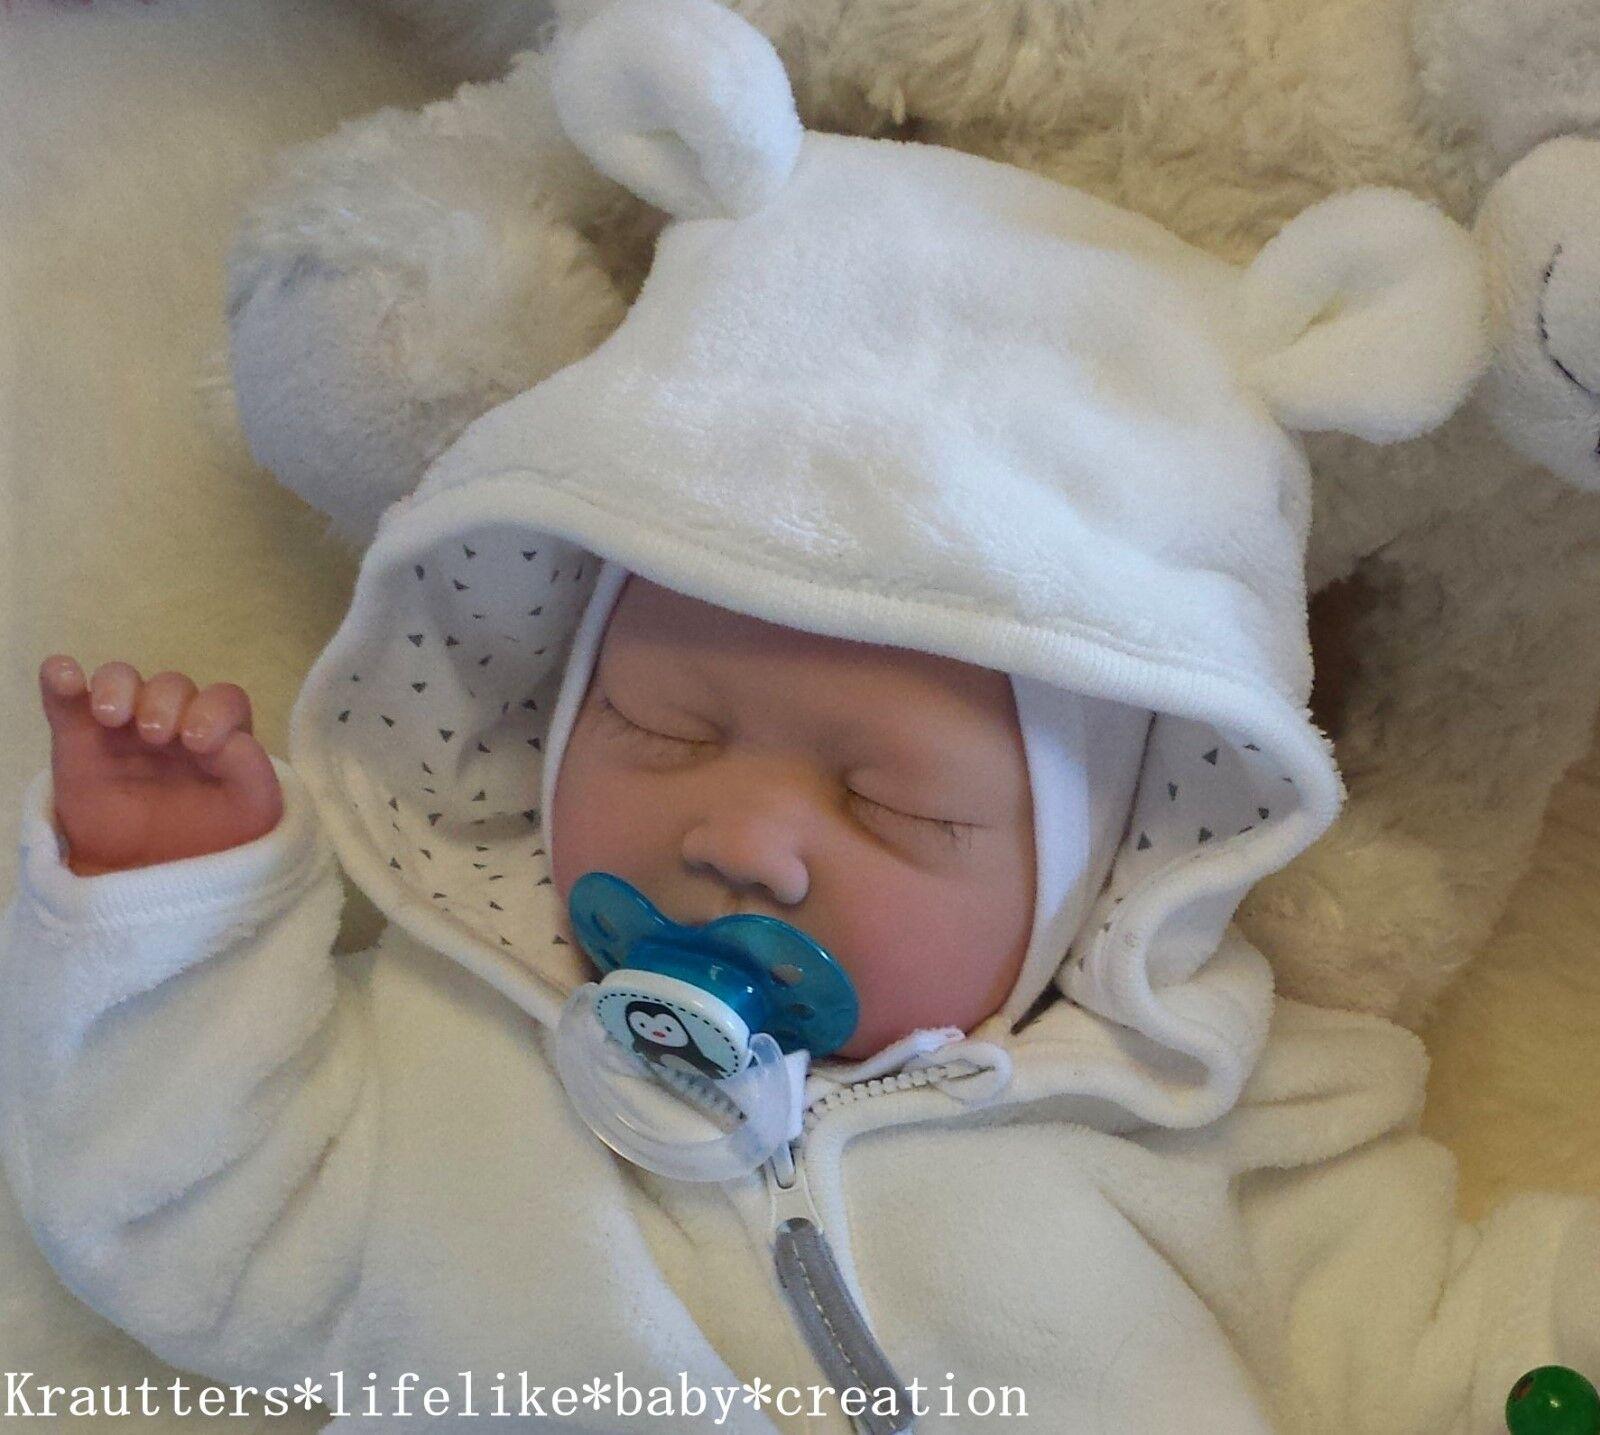 ✨ ♥Babyboy Reborn Reallife Oster Baby BS U.L Krautter Babypuppe Künstlerpuppe♥✨